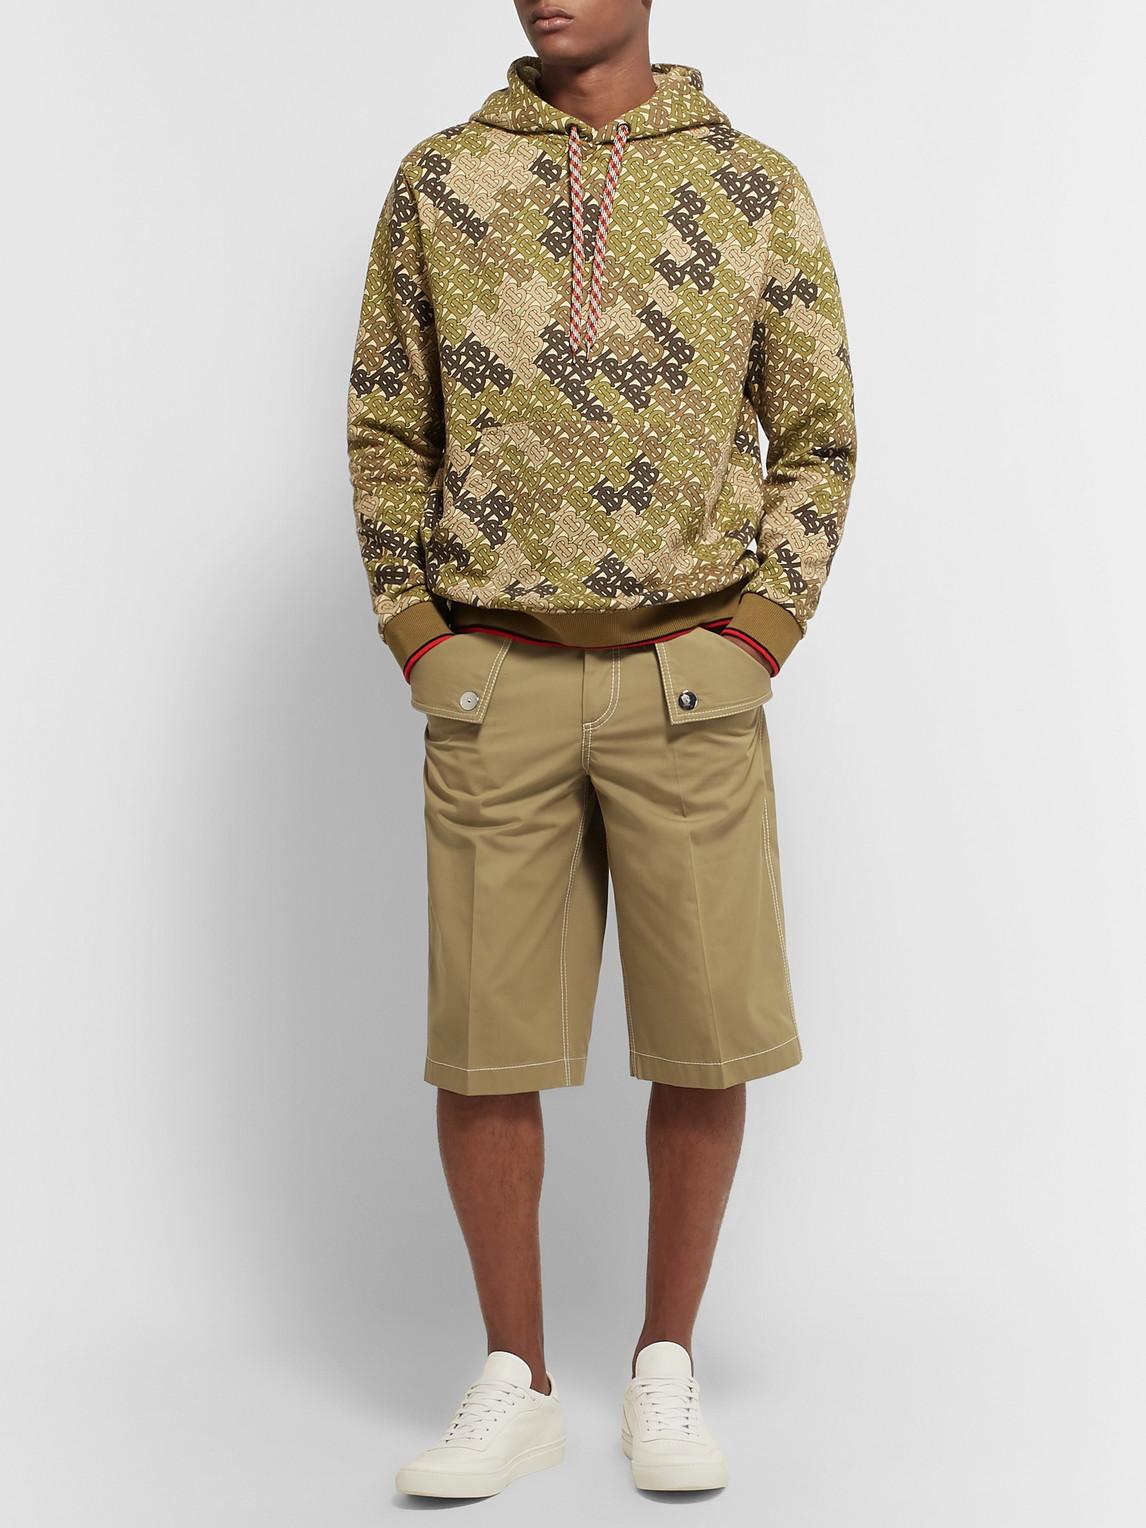 Burberry Shorts COTTON-TWILL BERMUDA SHORTS